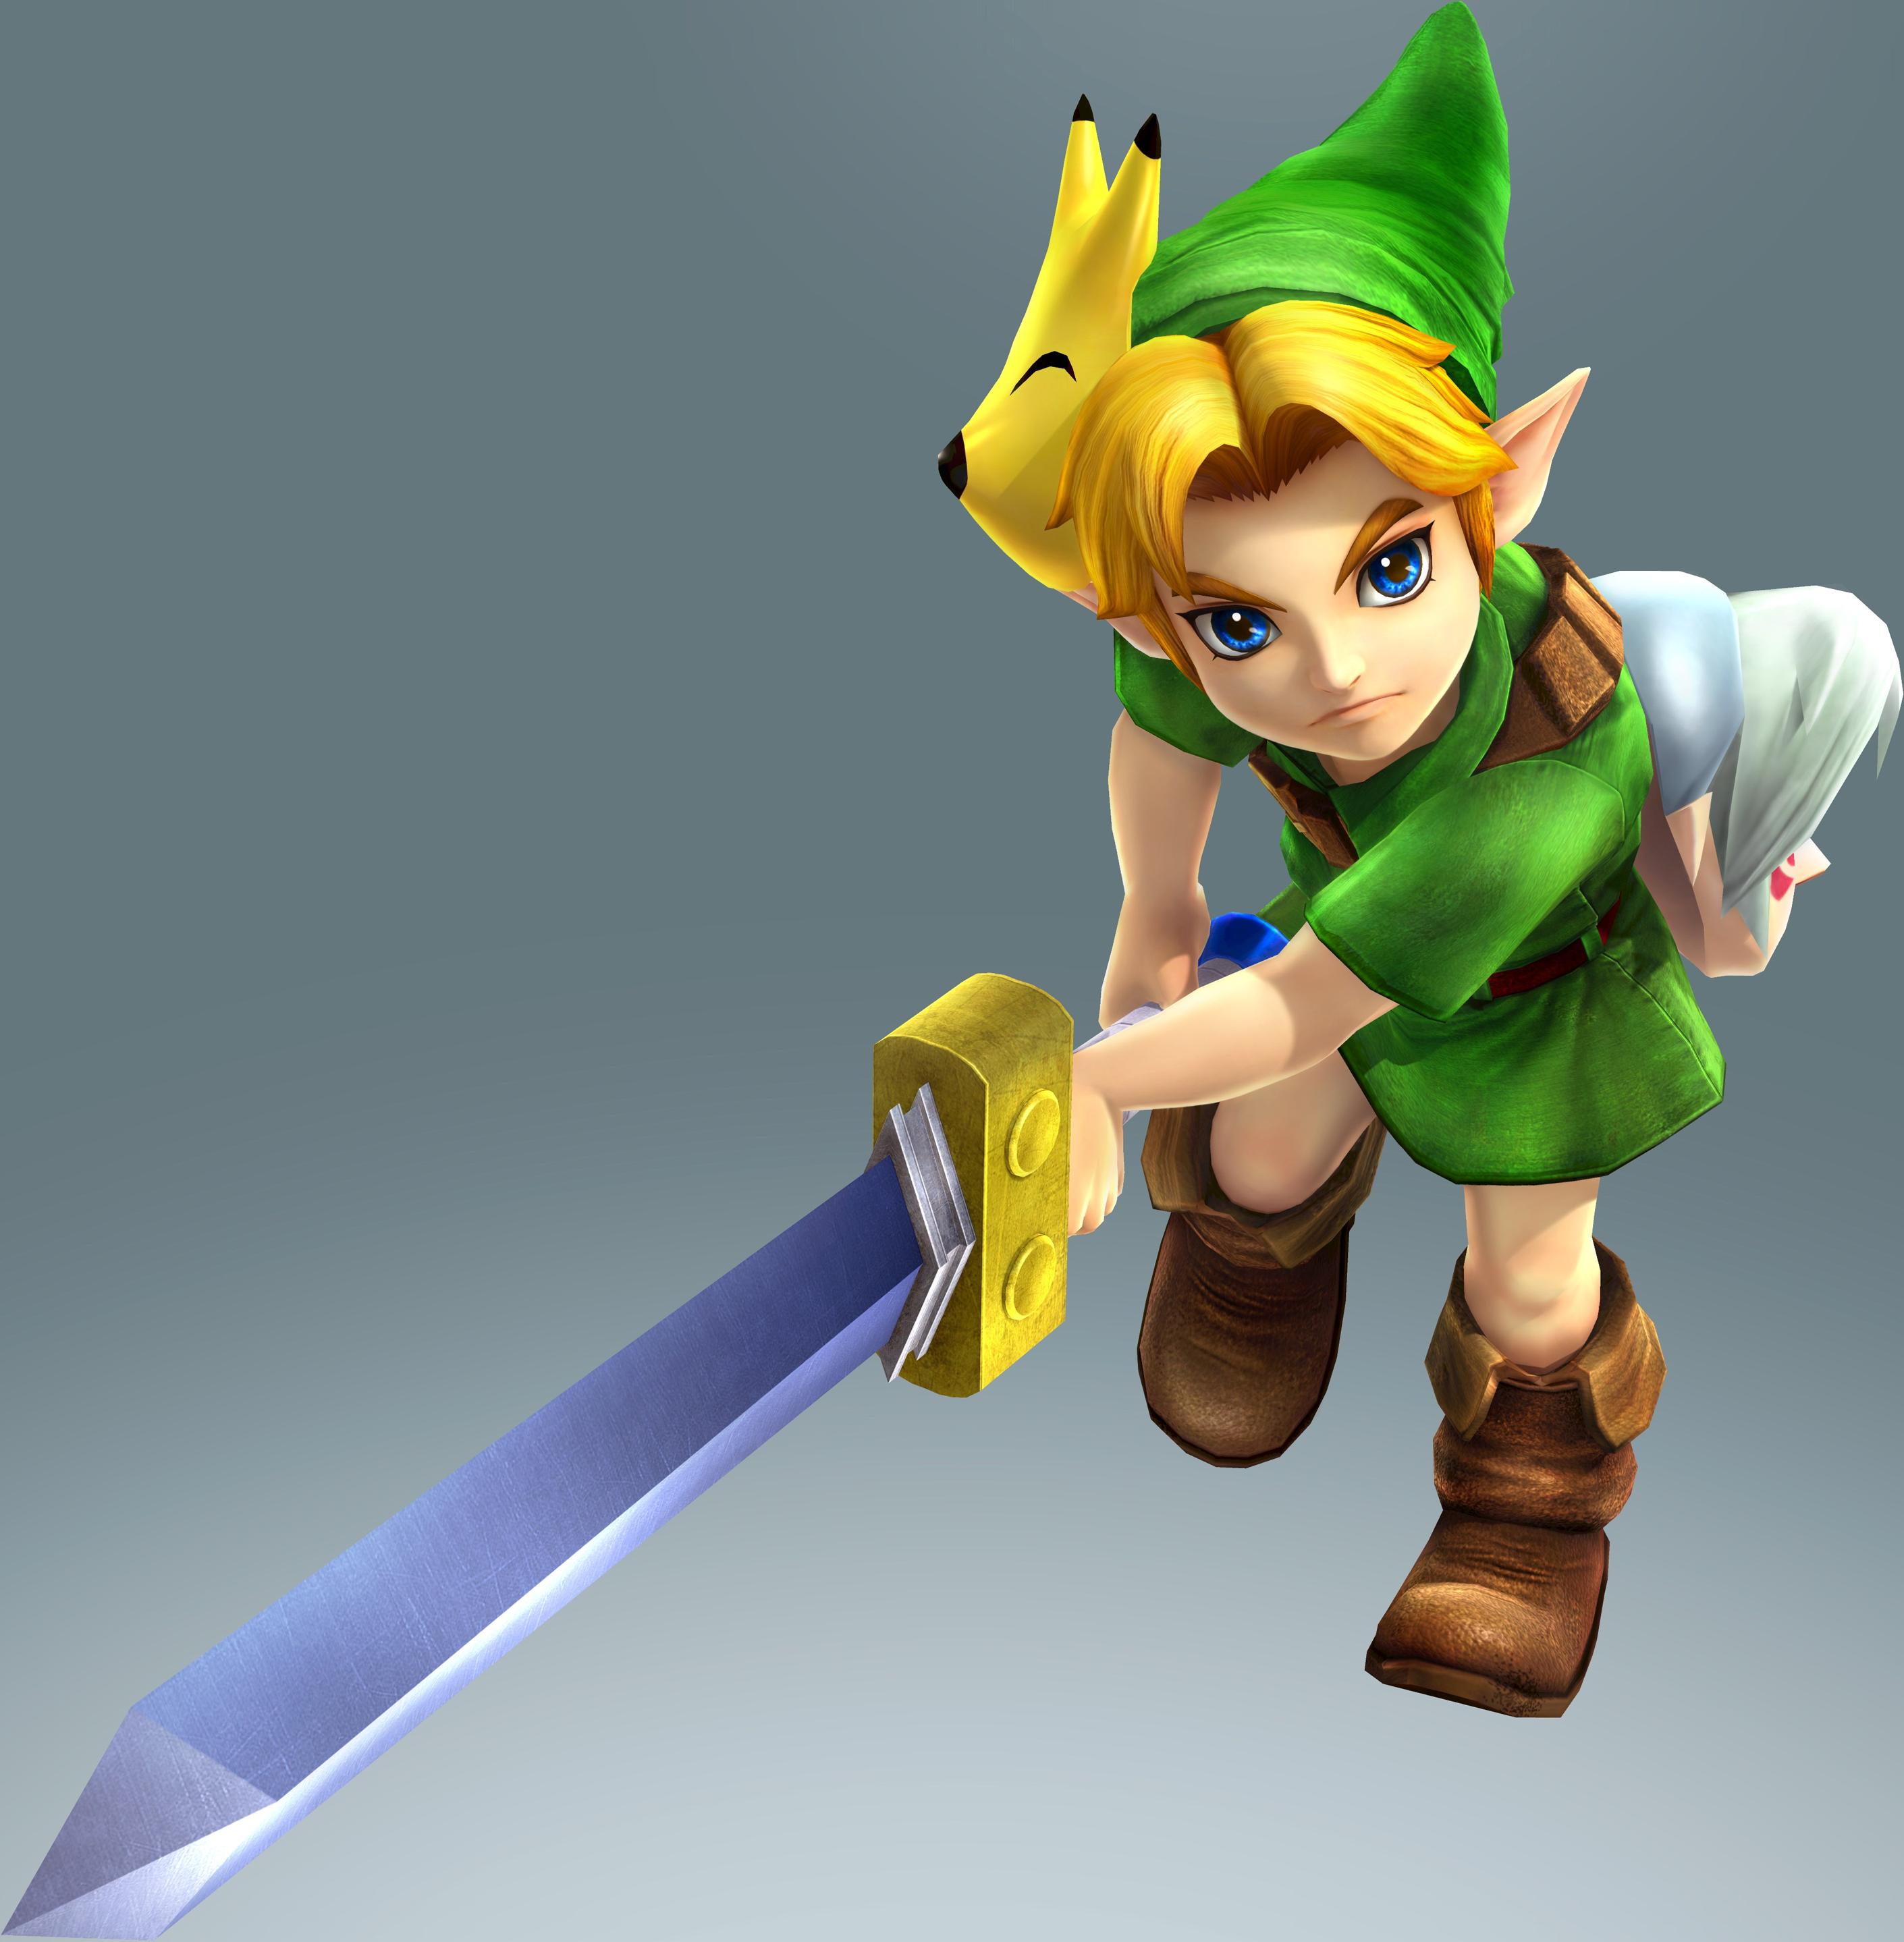 Mask Hyrule Warriors Zeldapedia Fandom